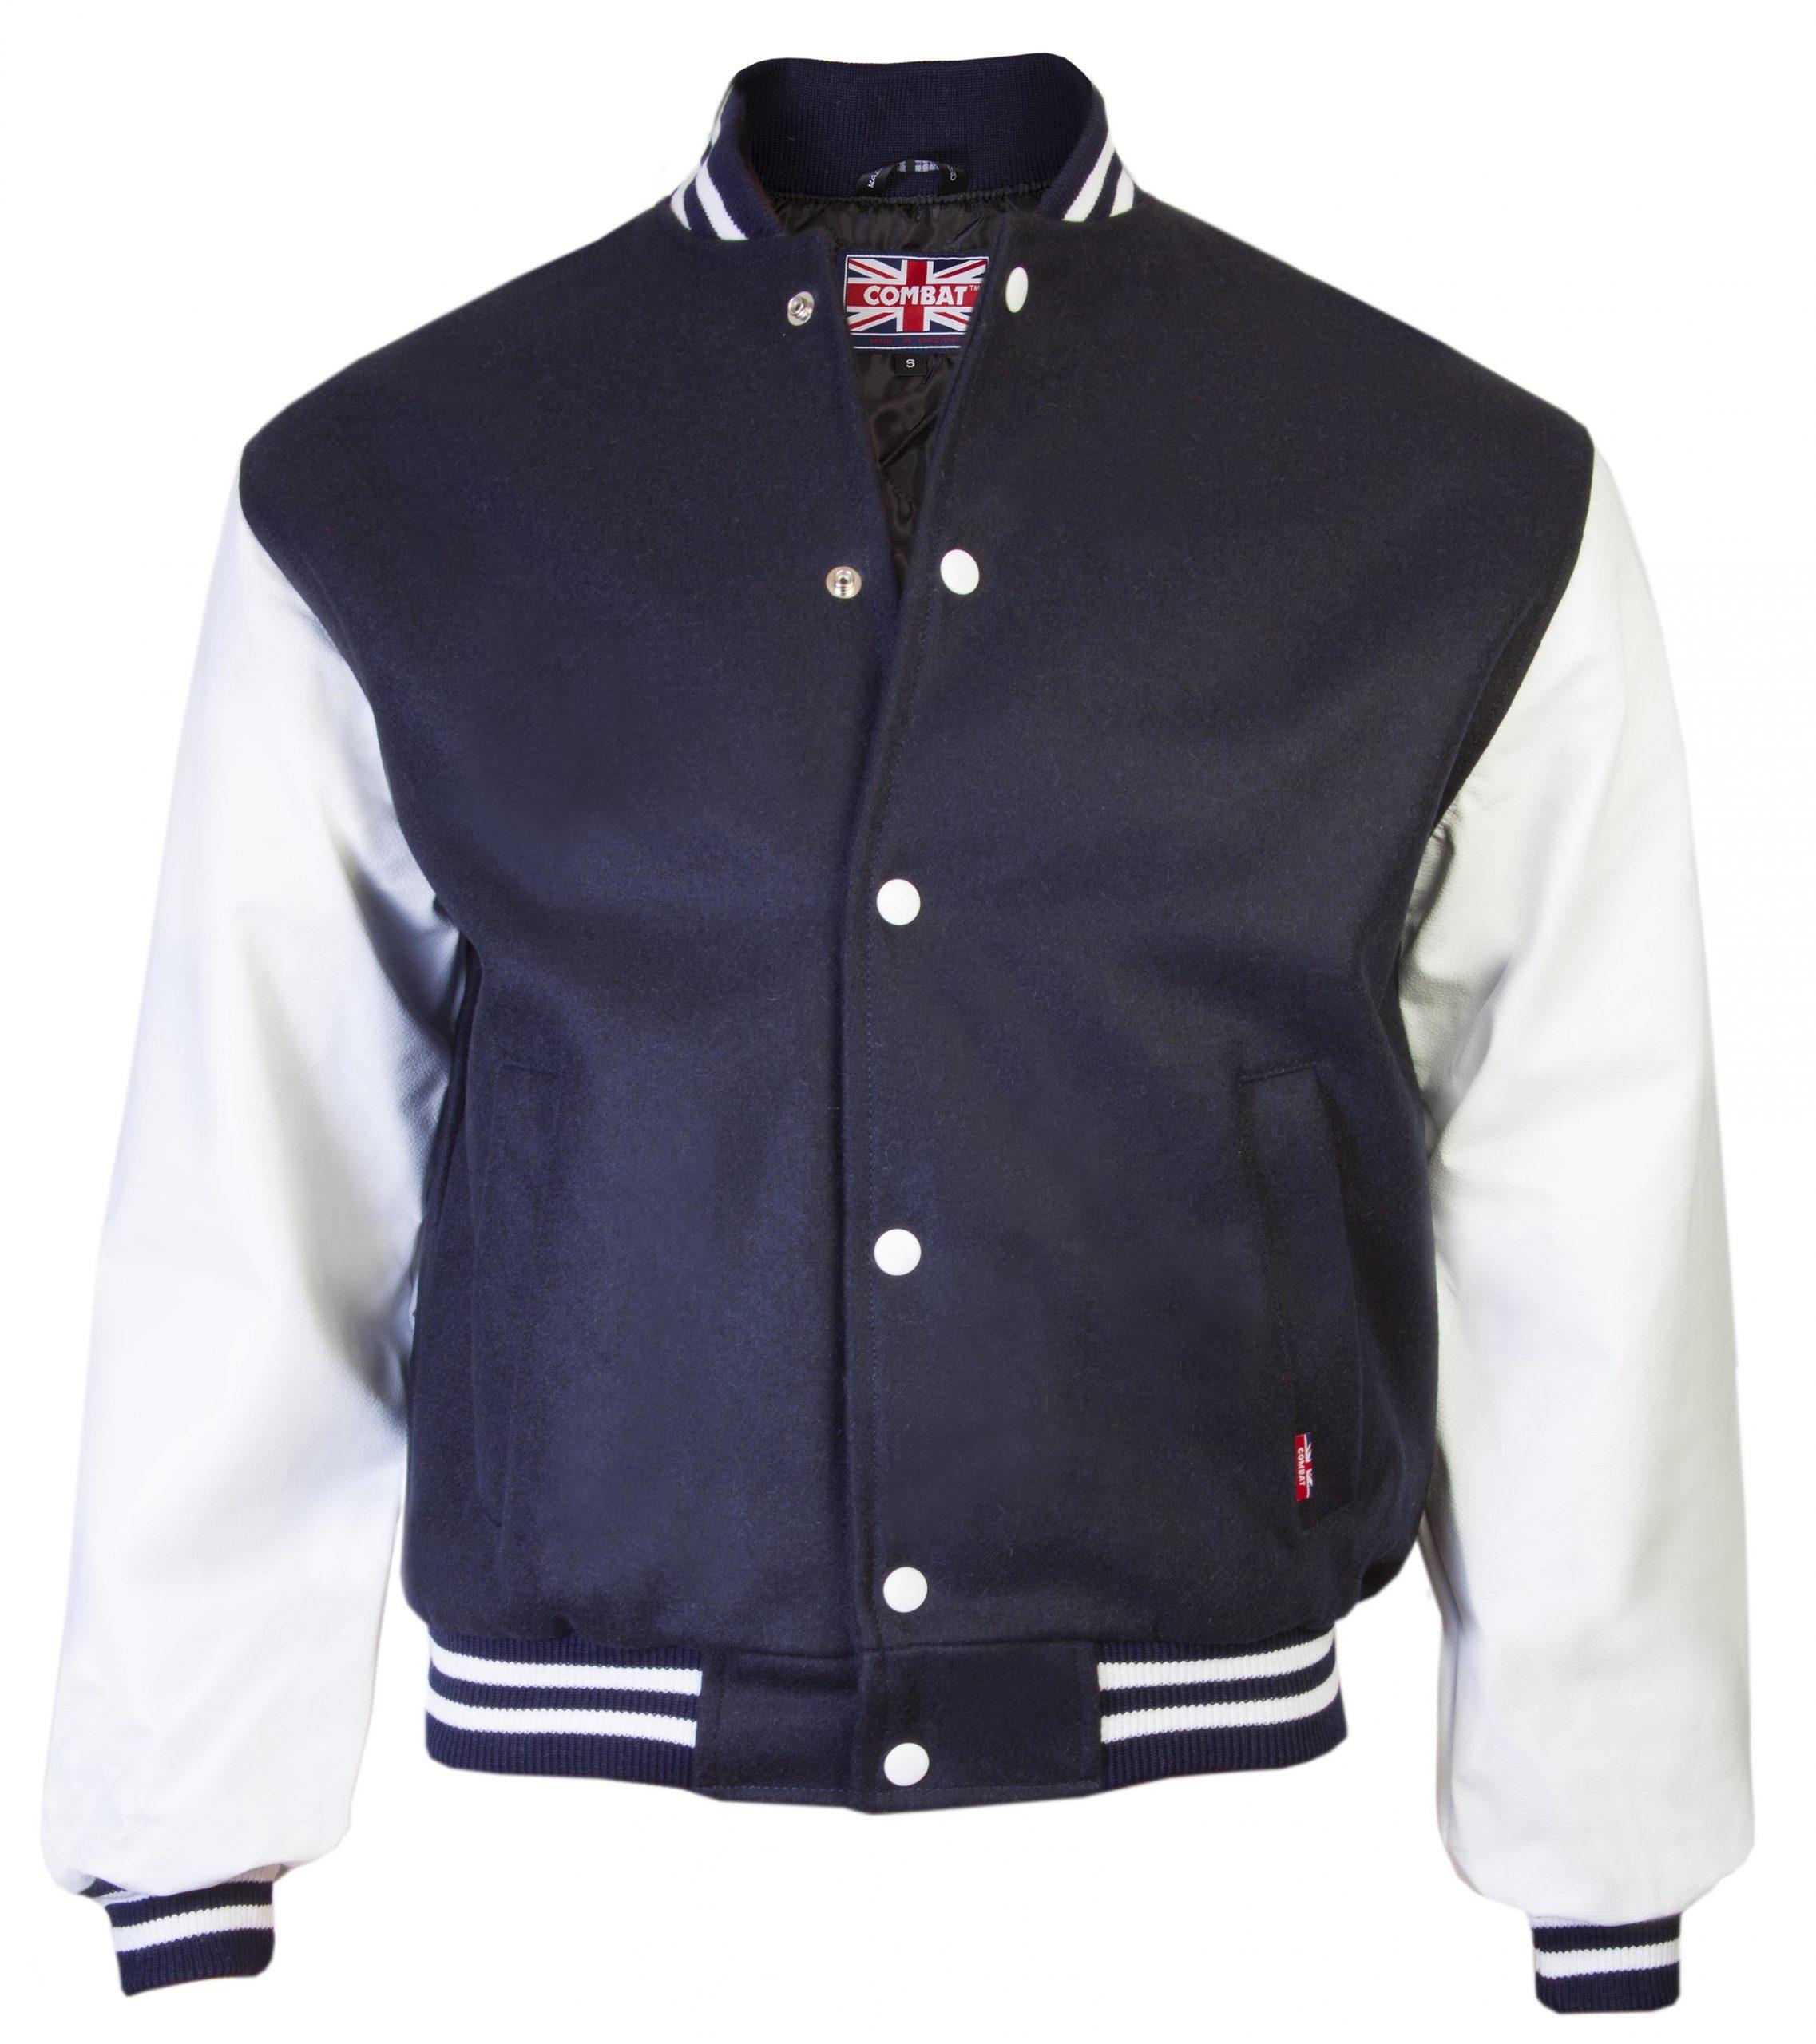 Baseball Jackets' Outfits